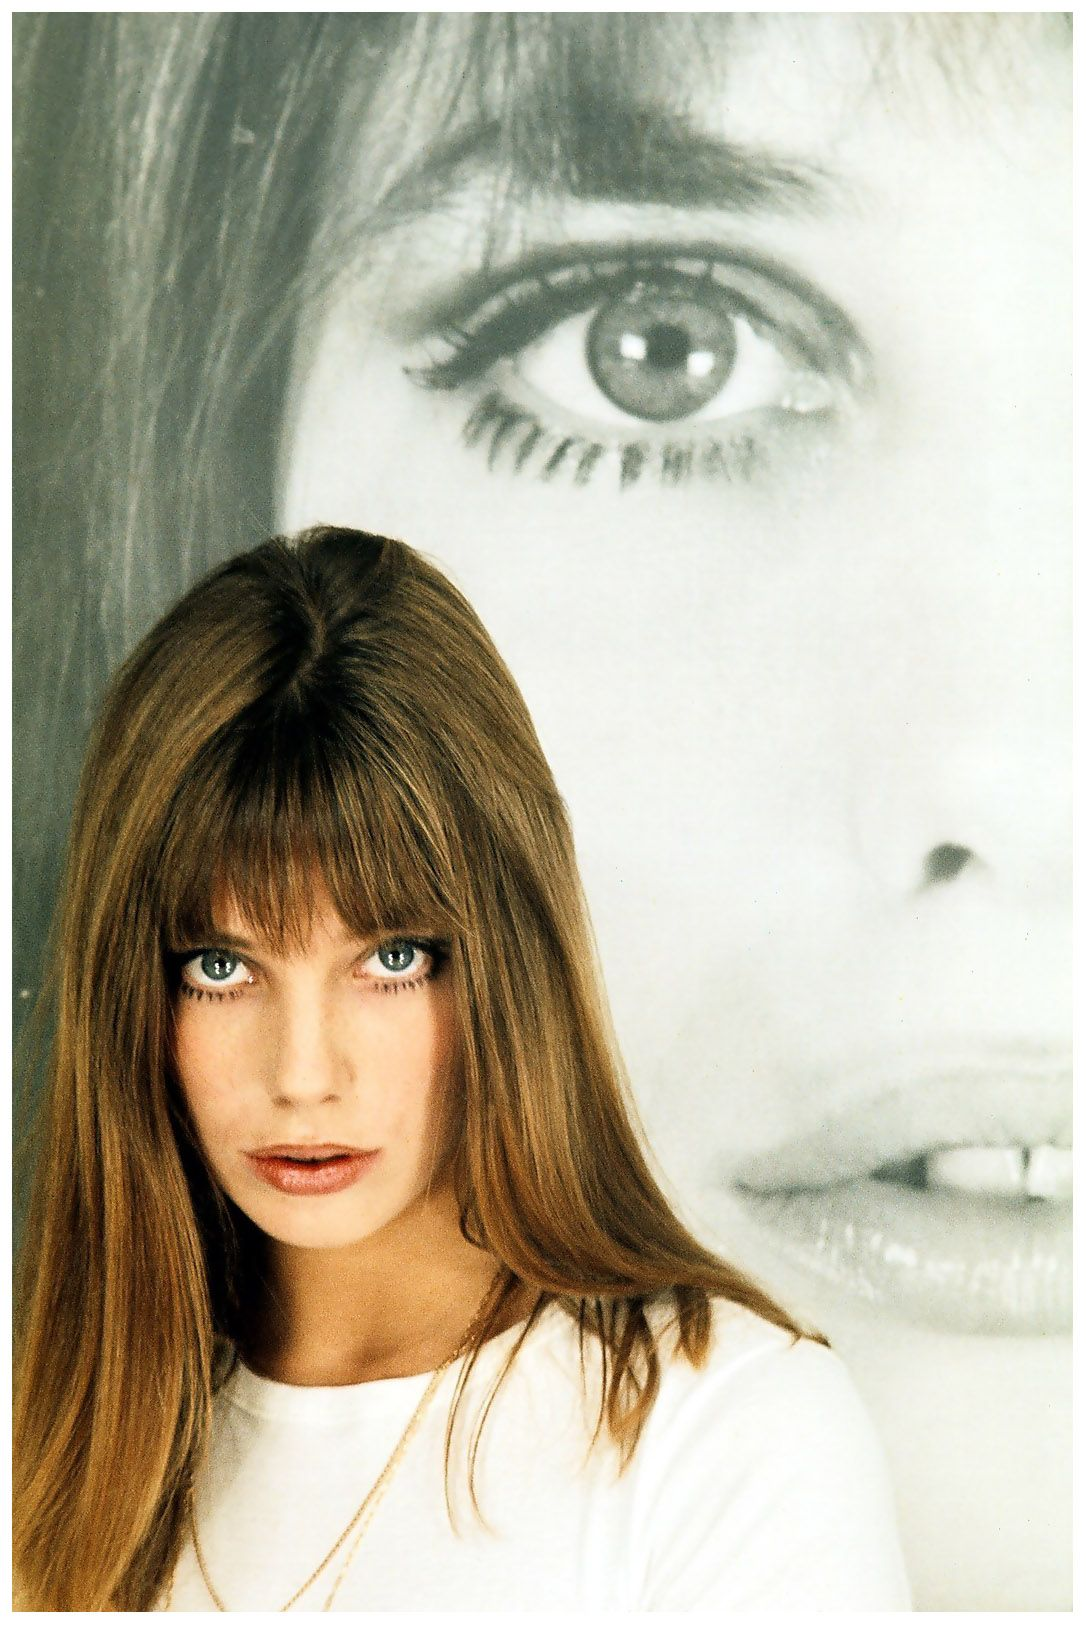 Jane birkin picture - Jane Birkin